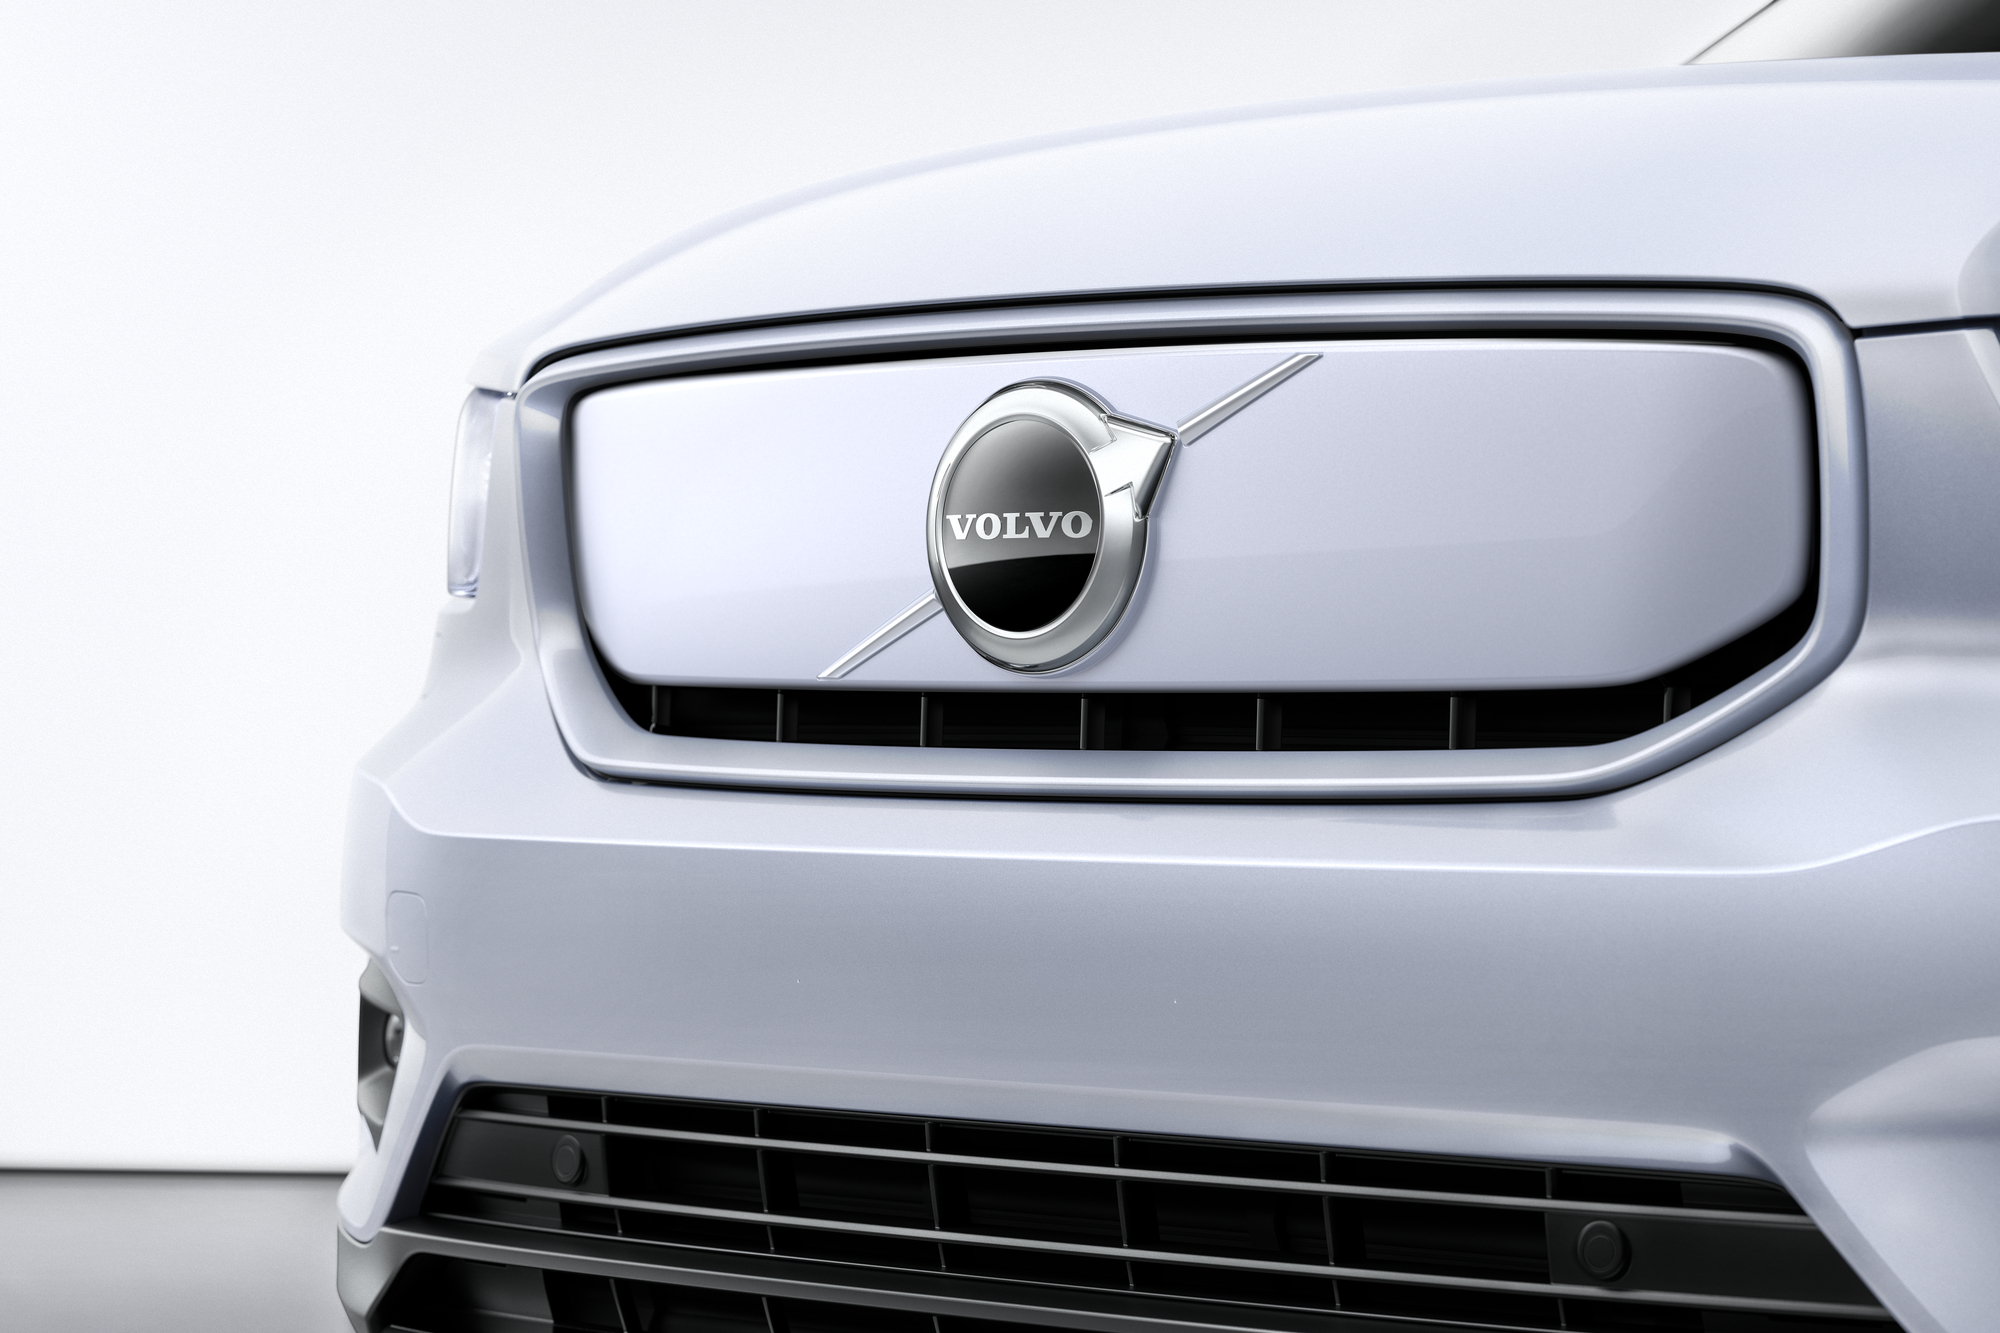 Volvo ХС40 Recharge ua фото экстерьера 1